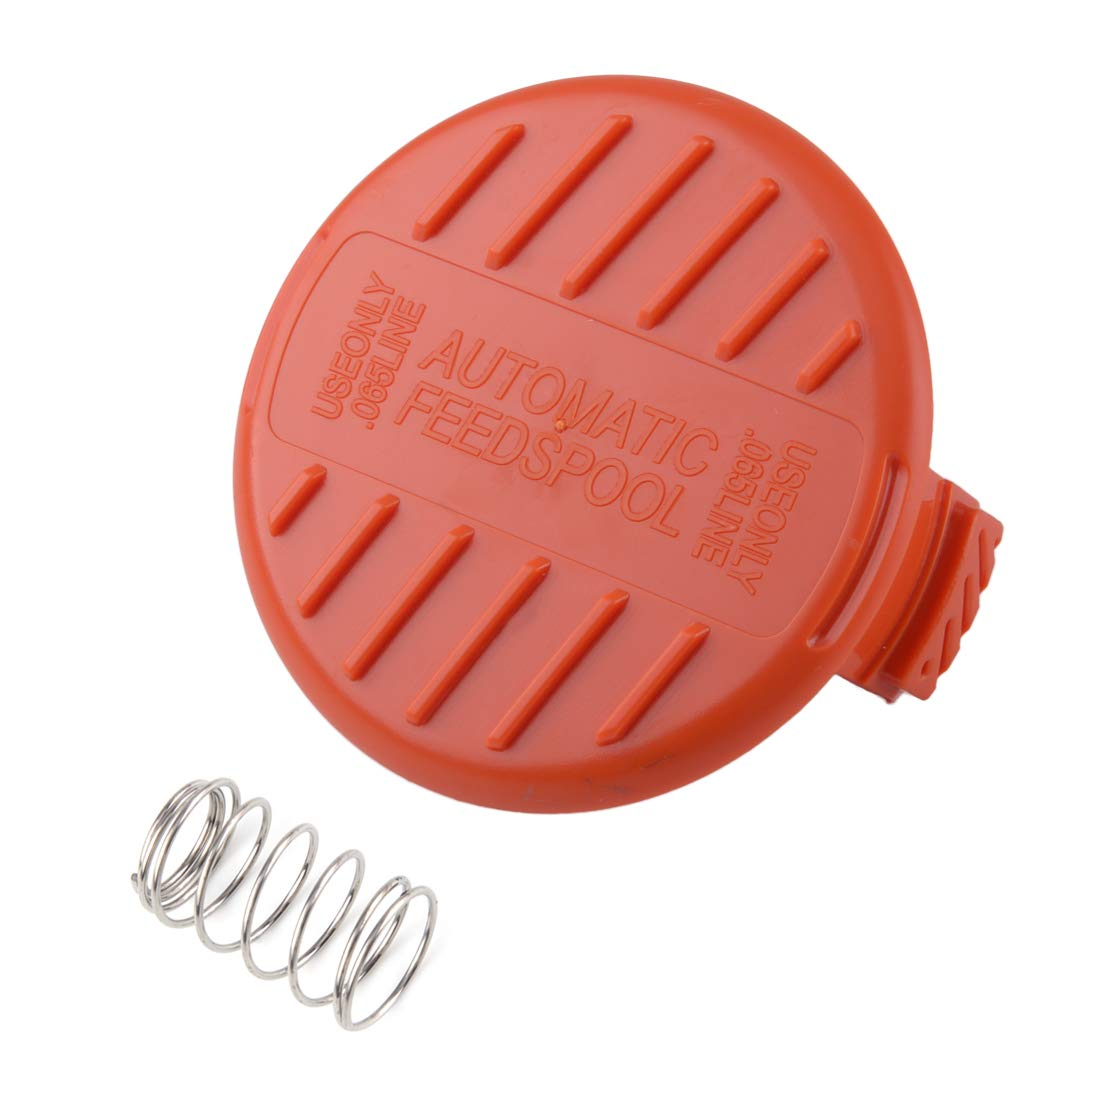 Spulenkapsel passend für Black& Decker GH400 GH500 GH600 GH612 GH900 GH912 ST6600 ST7000 ST7700 CST1000 CST1200 CST2000 MTC220 MTE912 NST2018 NST1118 NST2118 LST220 LST300 LST400 LST420 LST136 eastar